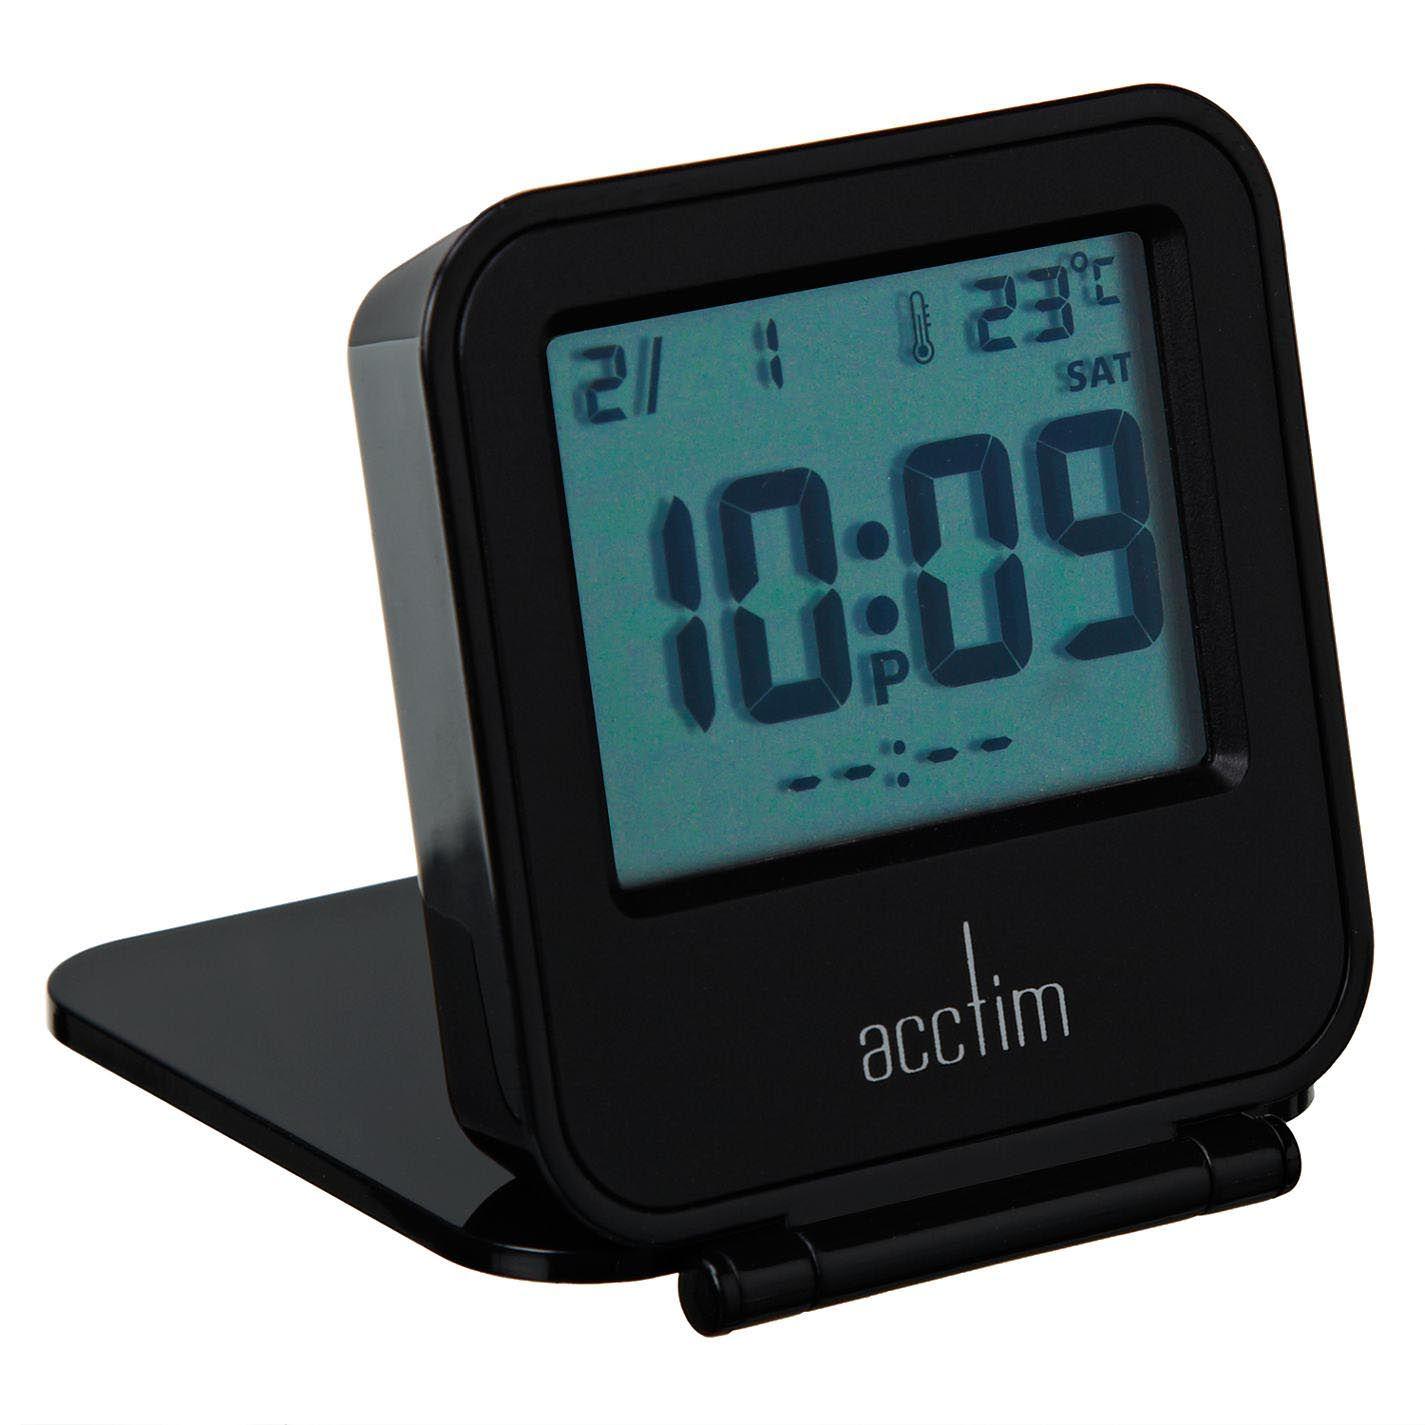 Coolest Digital Alarm Clocks Clock Cool Digital Clocks Alarm Clock